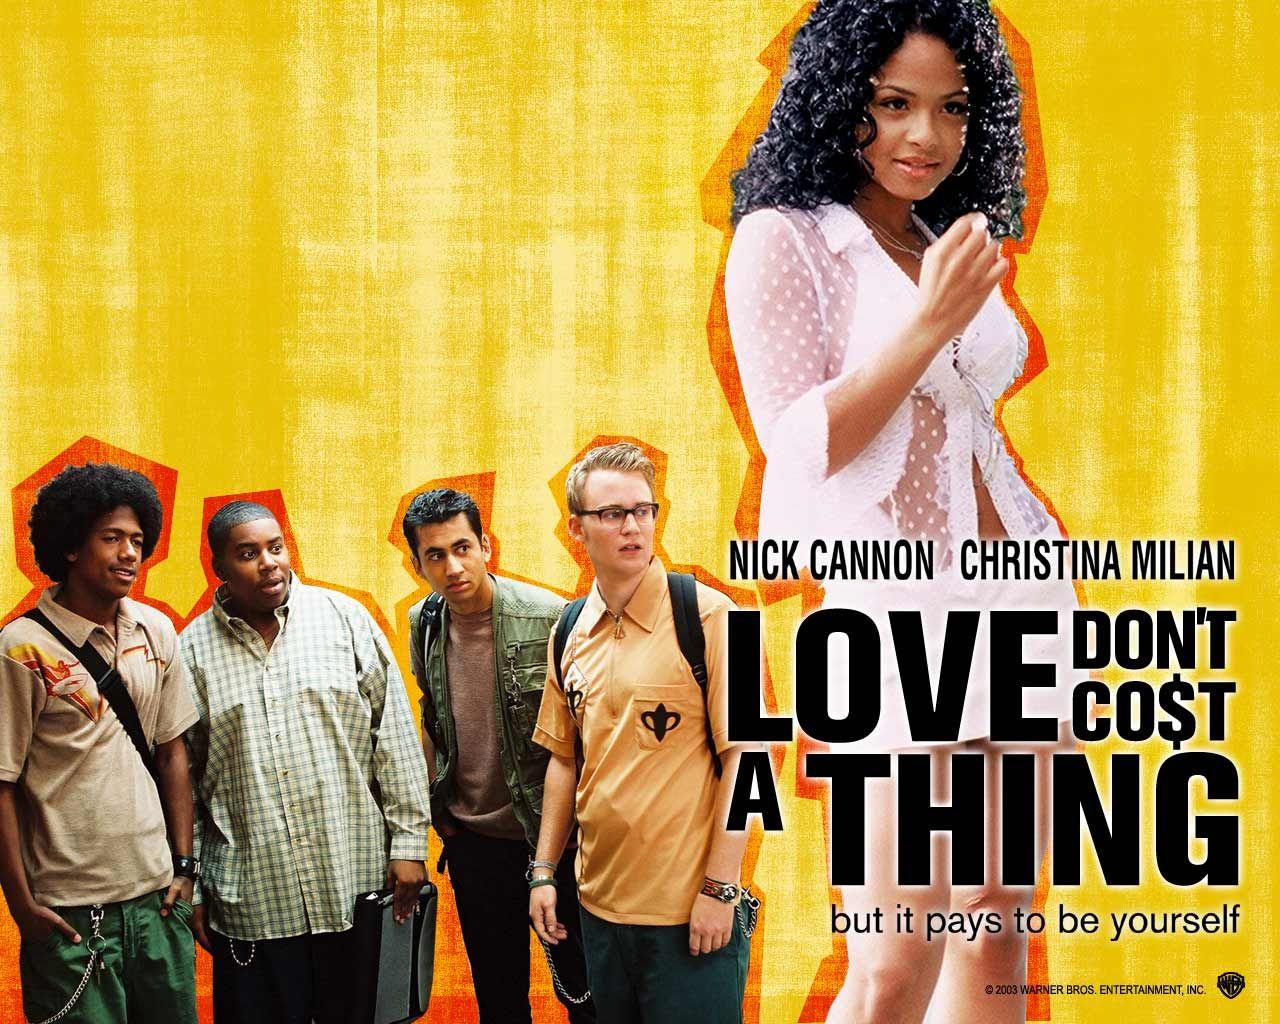 Nick Cannon And Christina Milian Movie